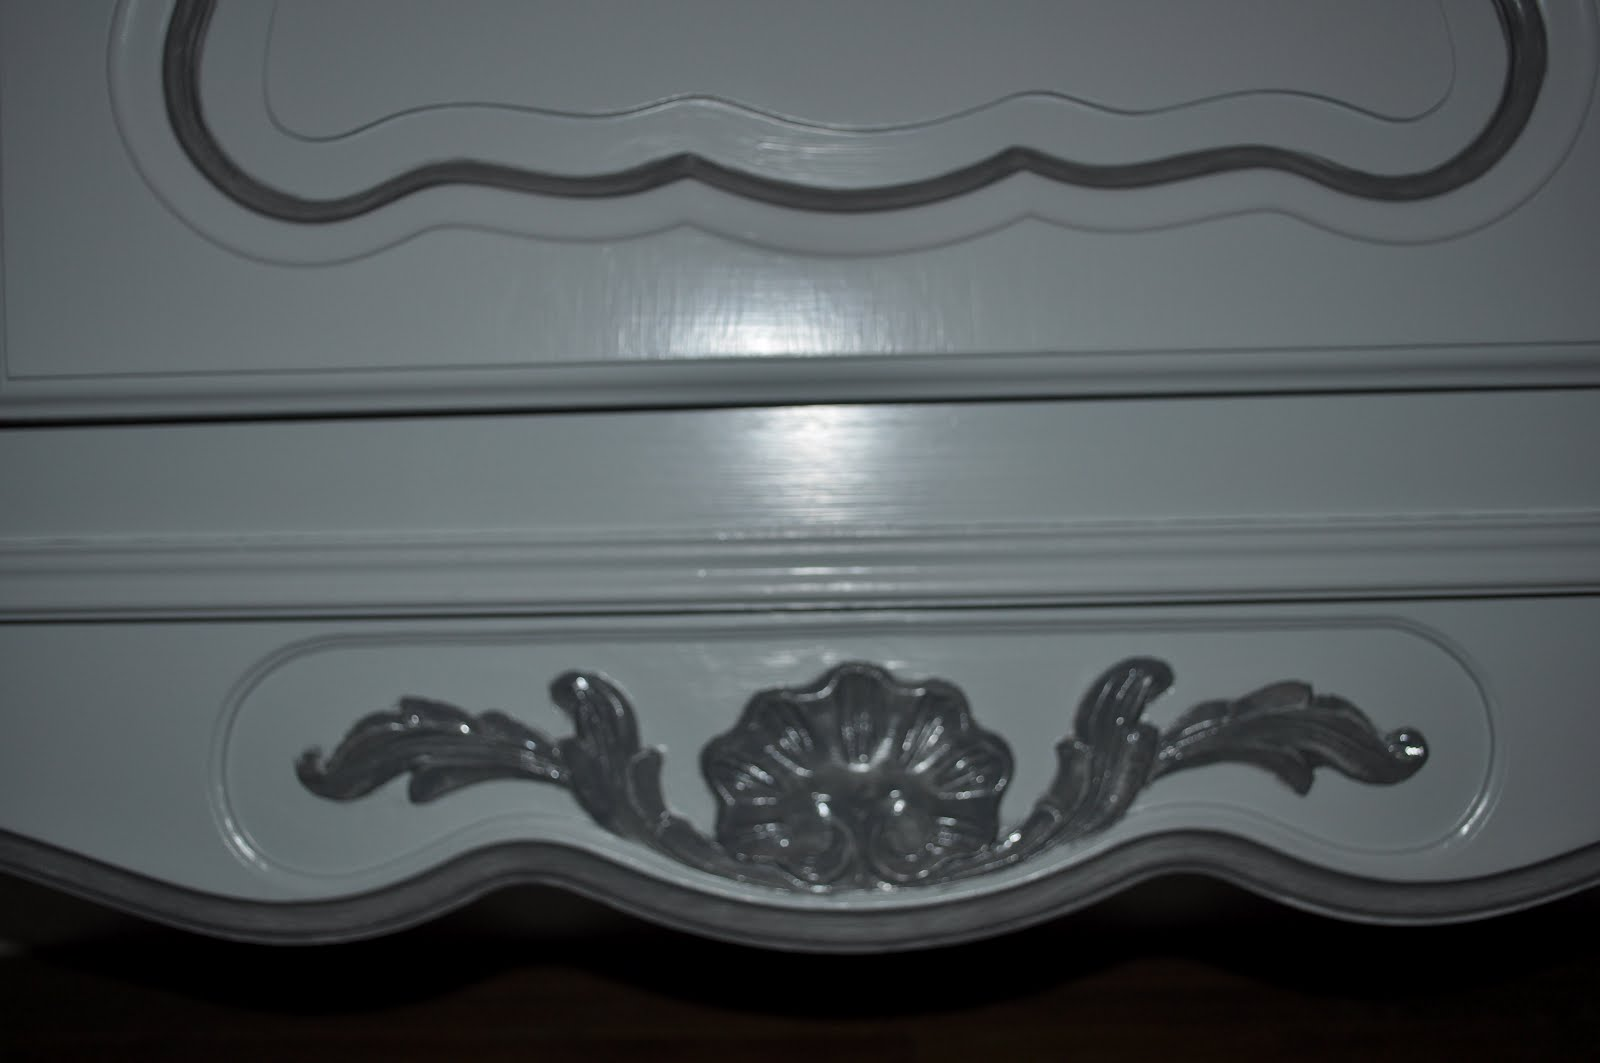 bois et patines nathalie madrenes repeindre une armoire vernie. Black Bedroom Furniture Sets. Home Design Ideas